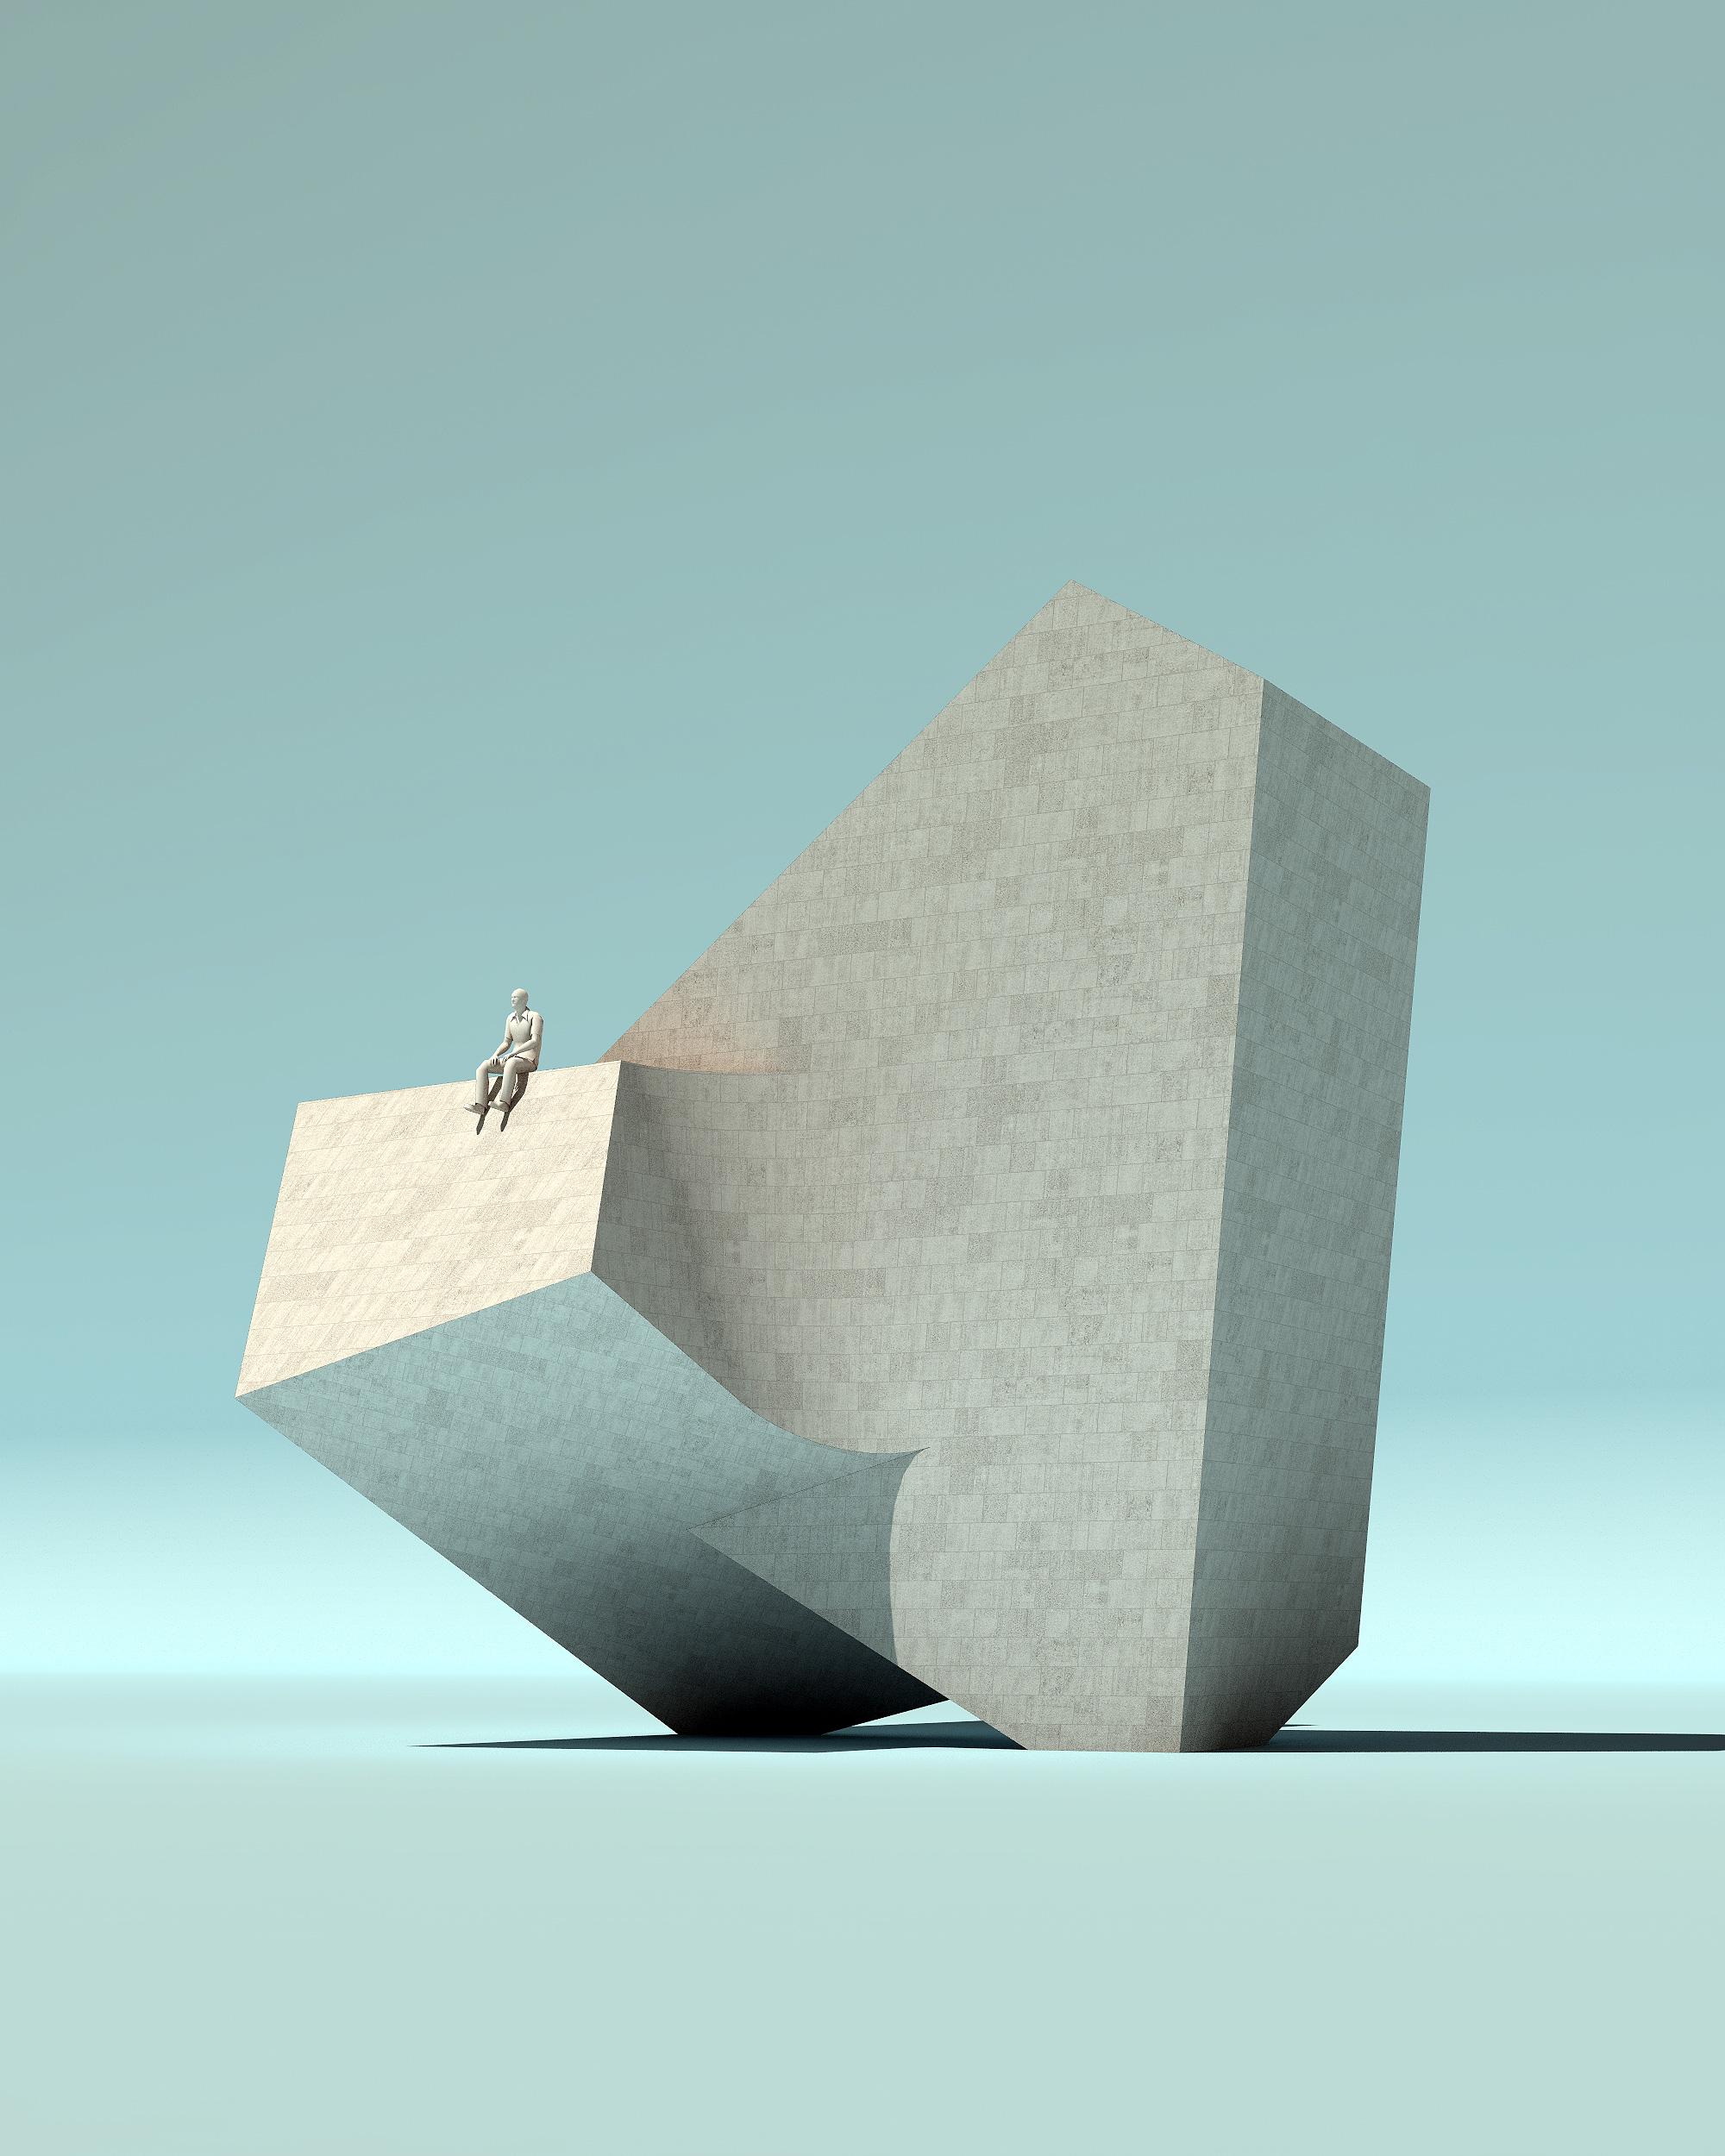 ww-blended-pyramid.jpg